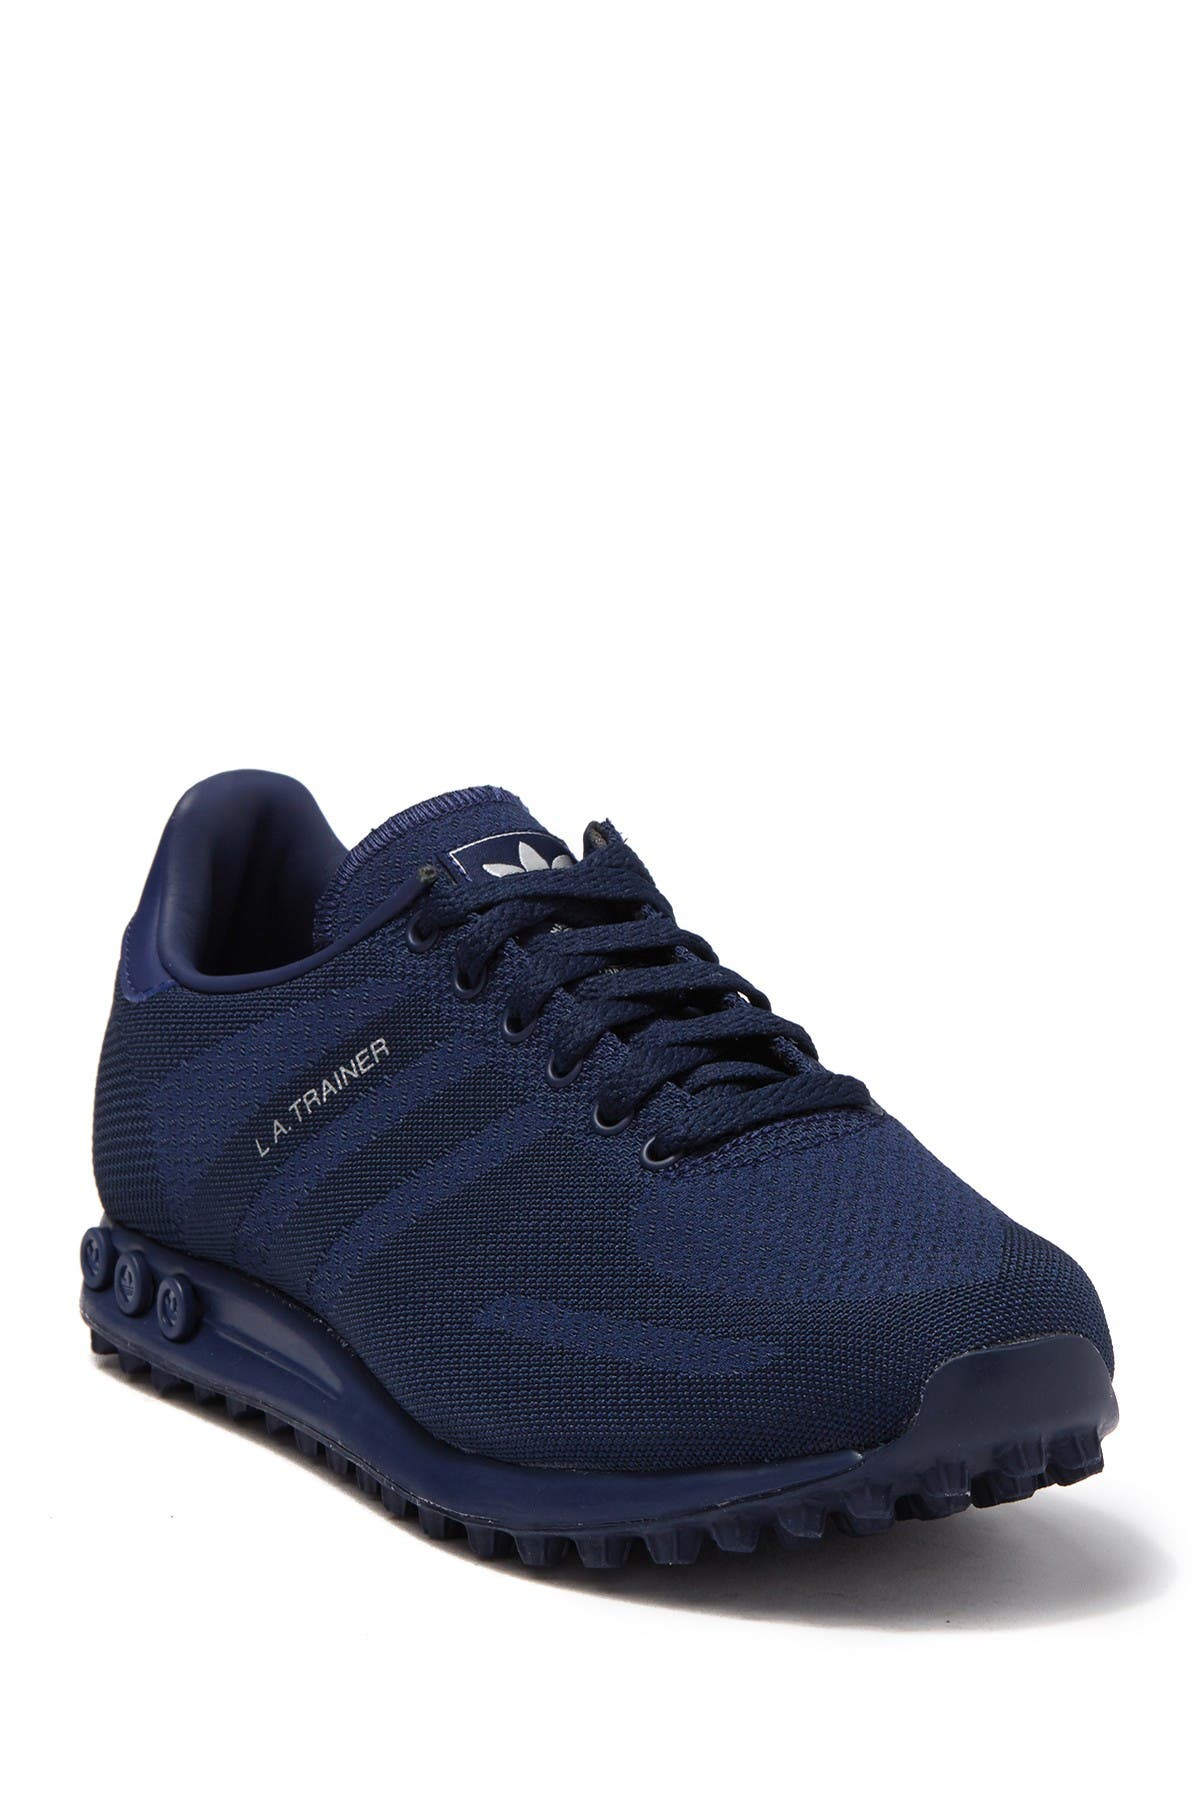 adidas sneaker la trainer